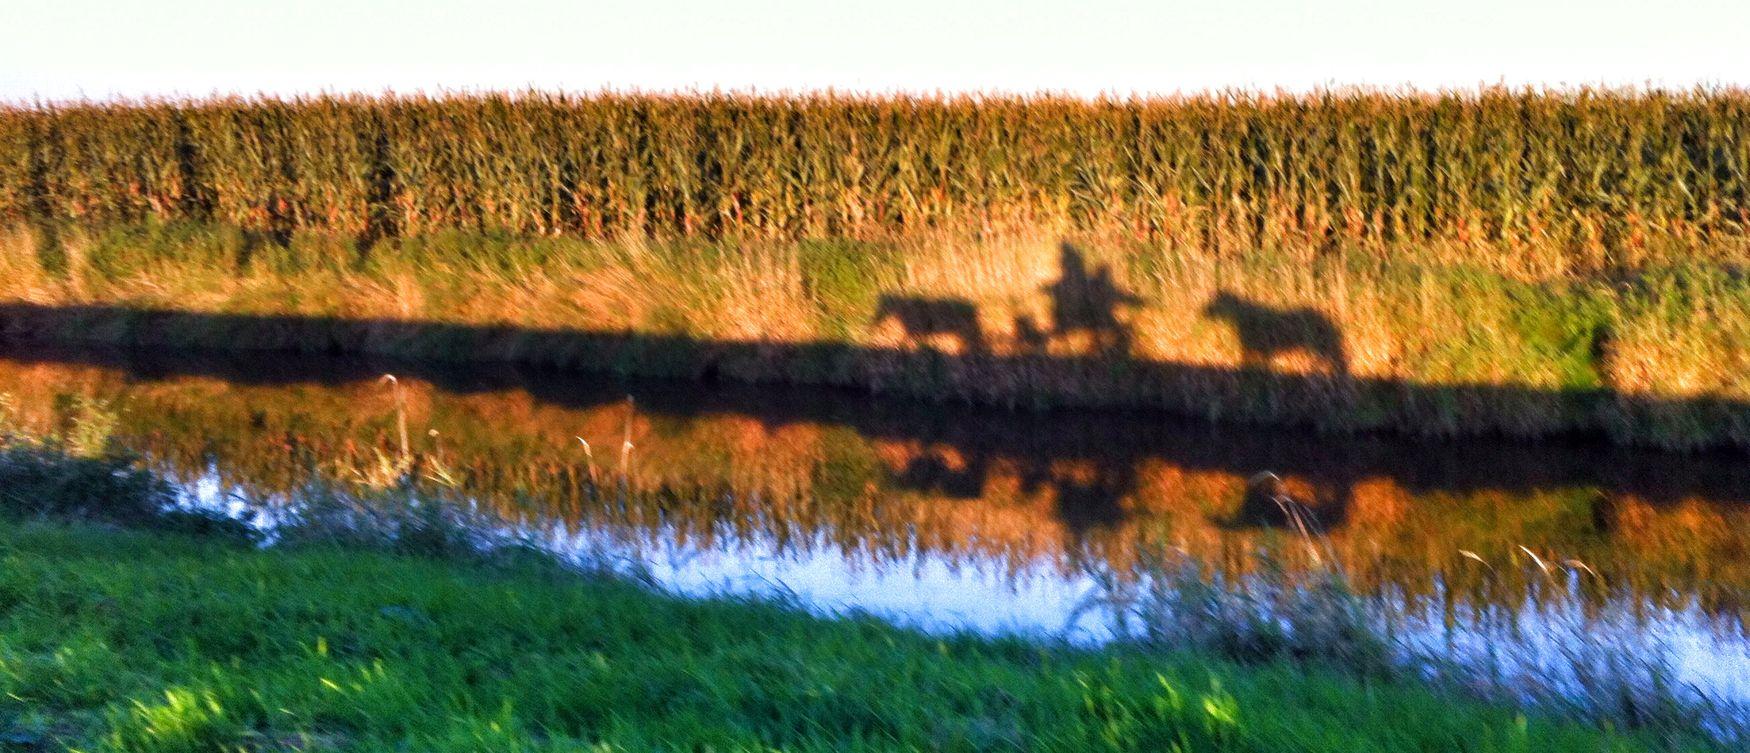 Kutschfahrt mit Reservepony. Ostfriesland Arte.fakt Backemoor Pferdekutsche Kutsche Kutschfahrt